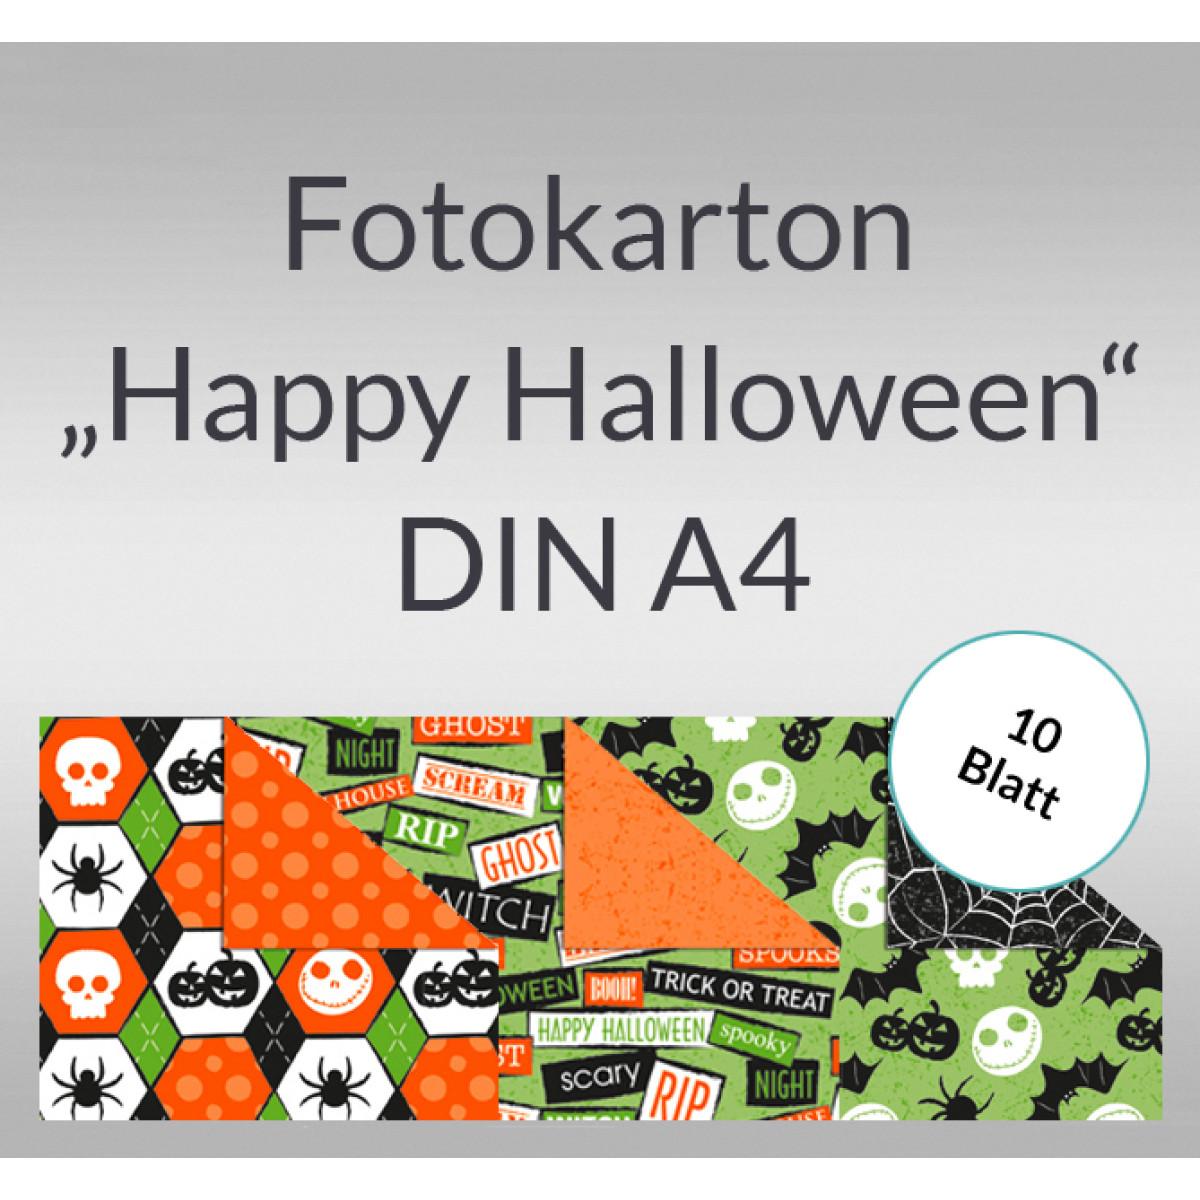 Fotokarton Happy Halloween Din A4 10 Blatt